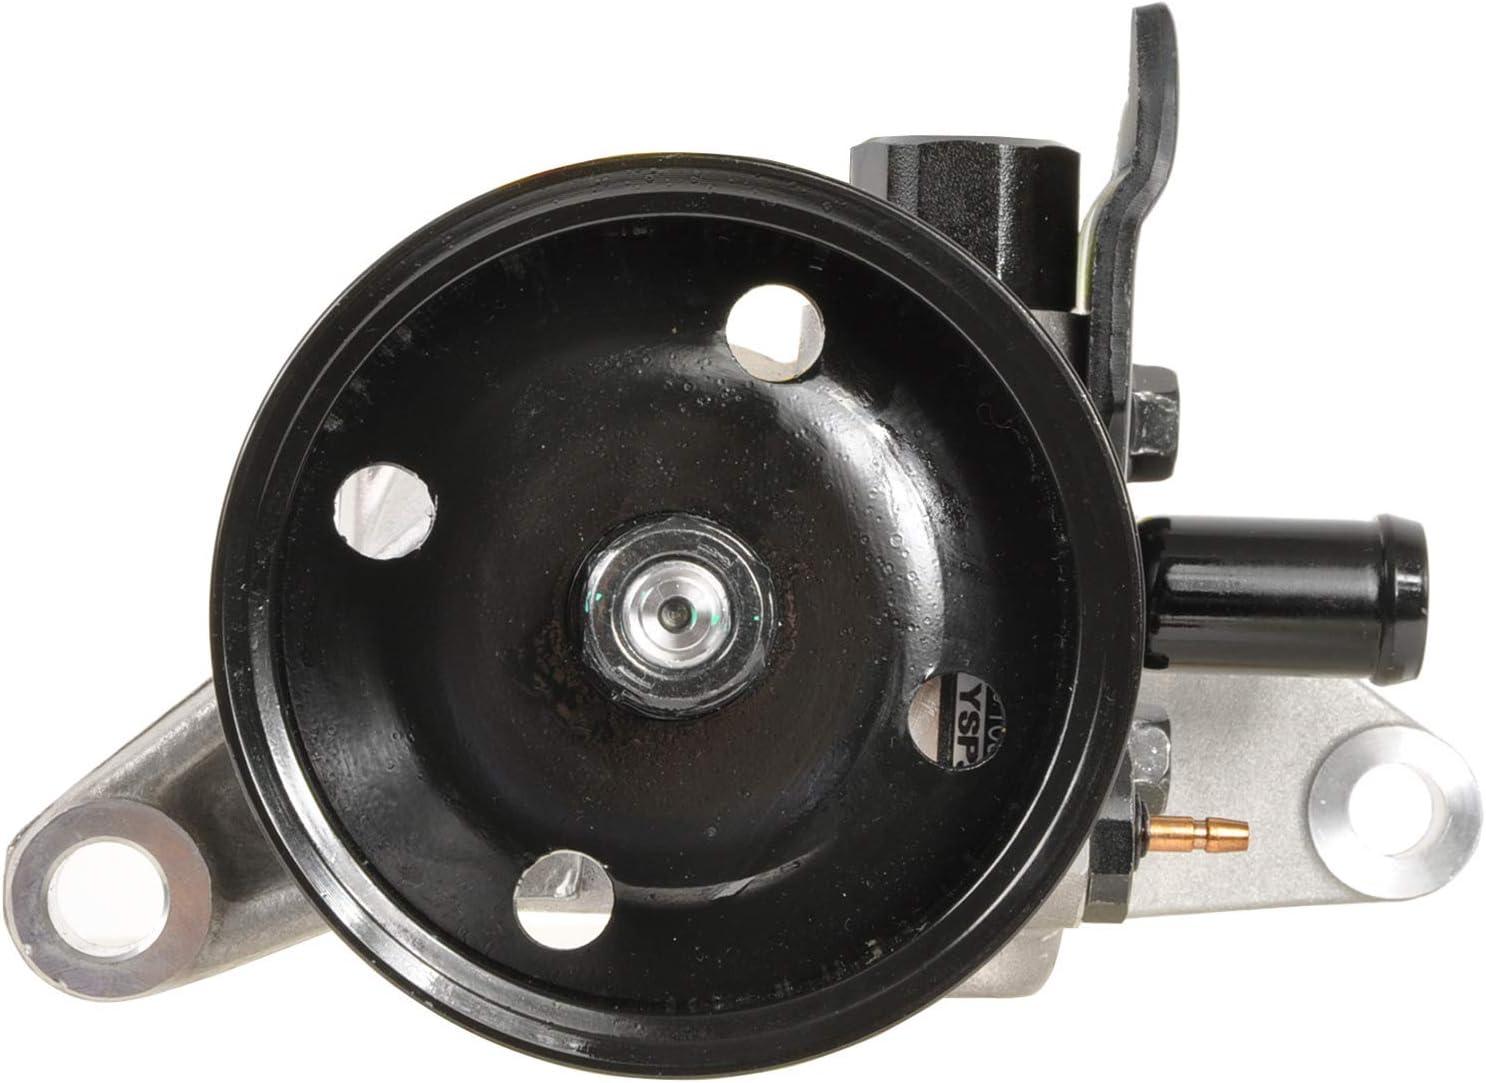 Cardone 96-5354 New Limited price sale Power Steering Under blast sales without Pump Reservoir